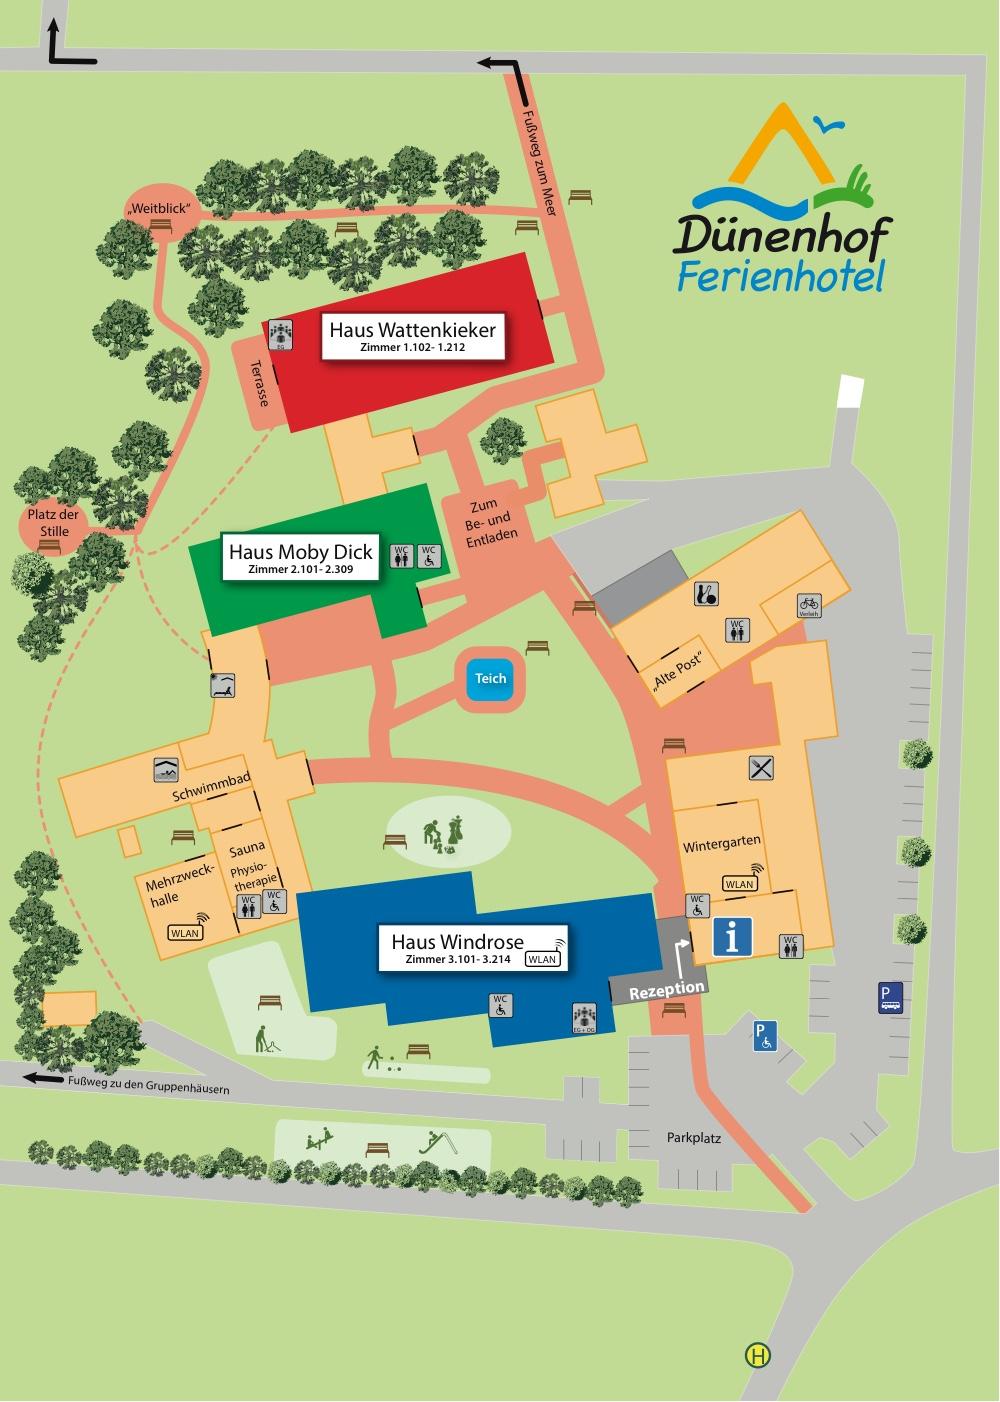 Dünenhof Ferienhotel Lageplan